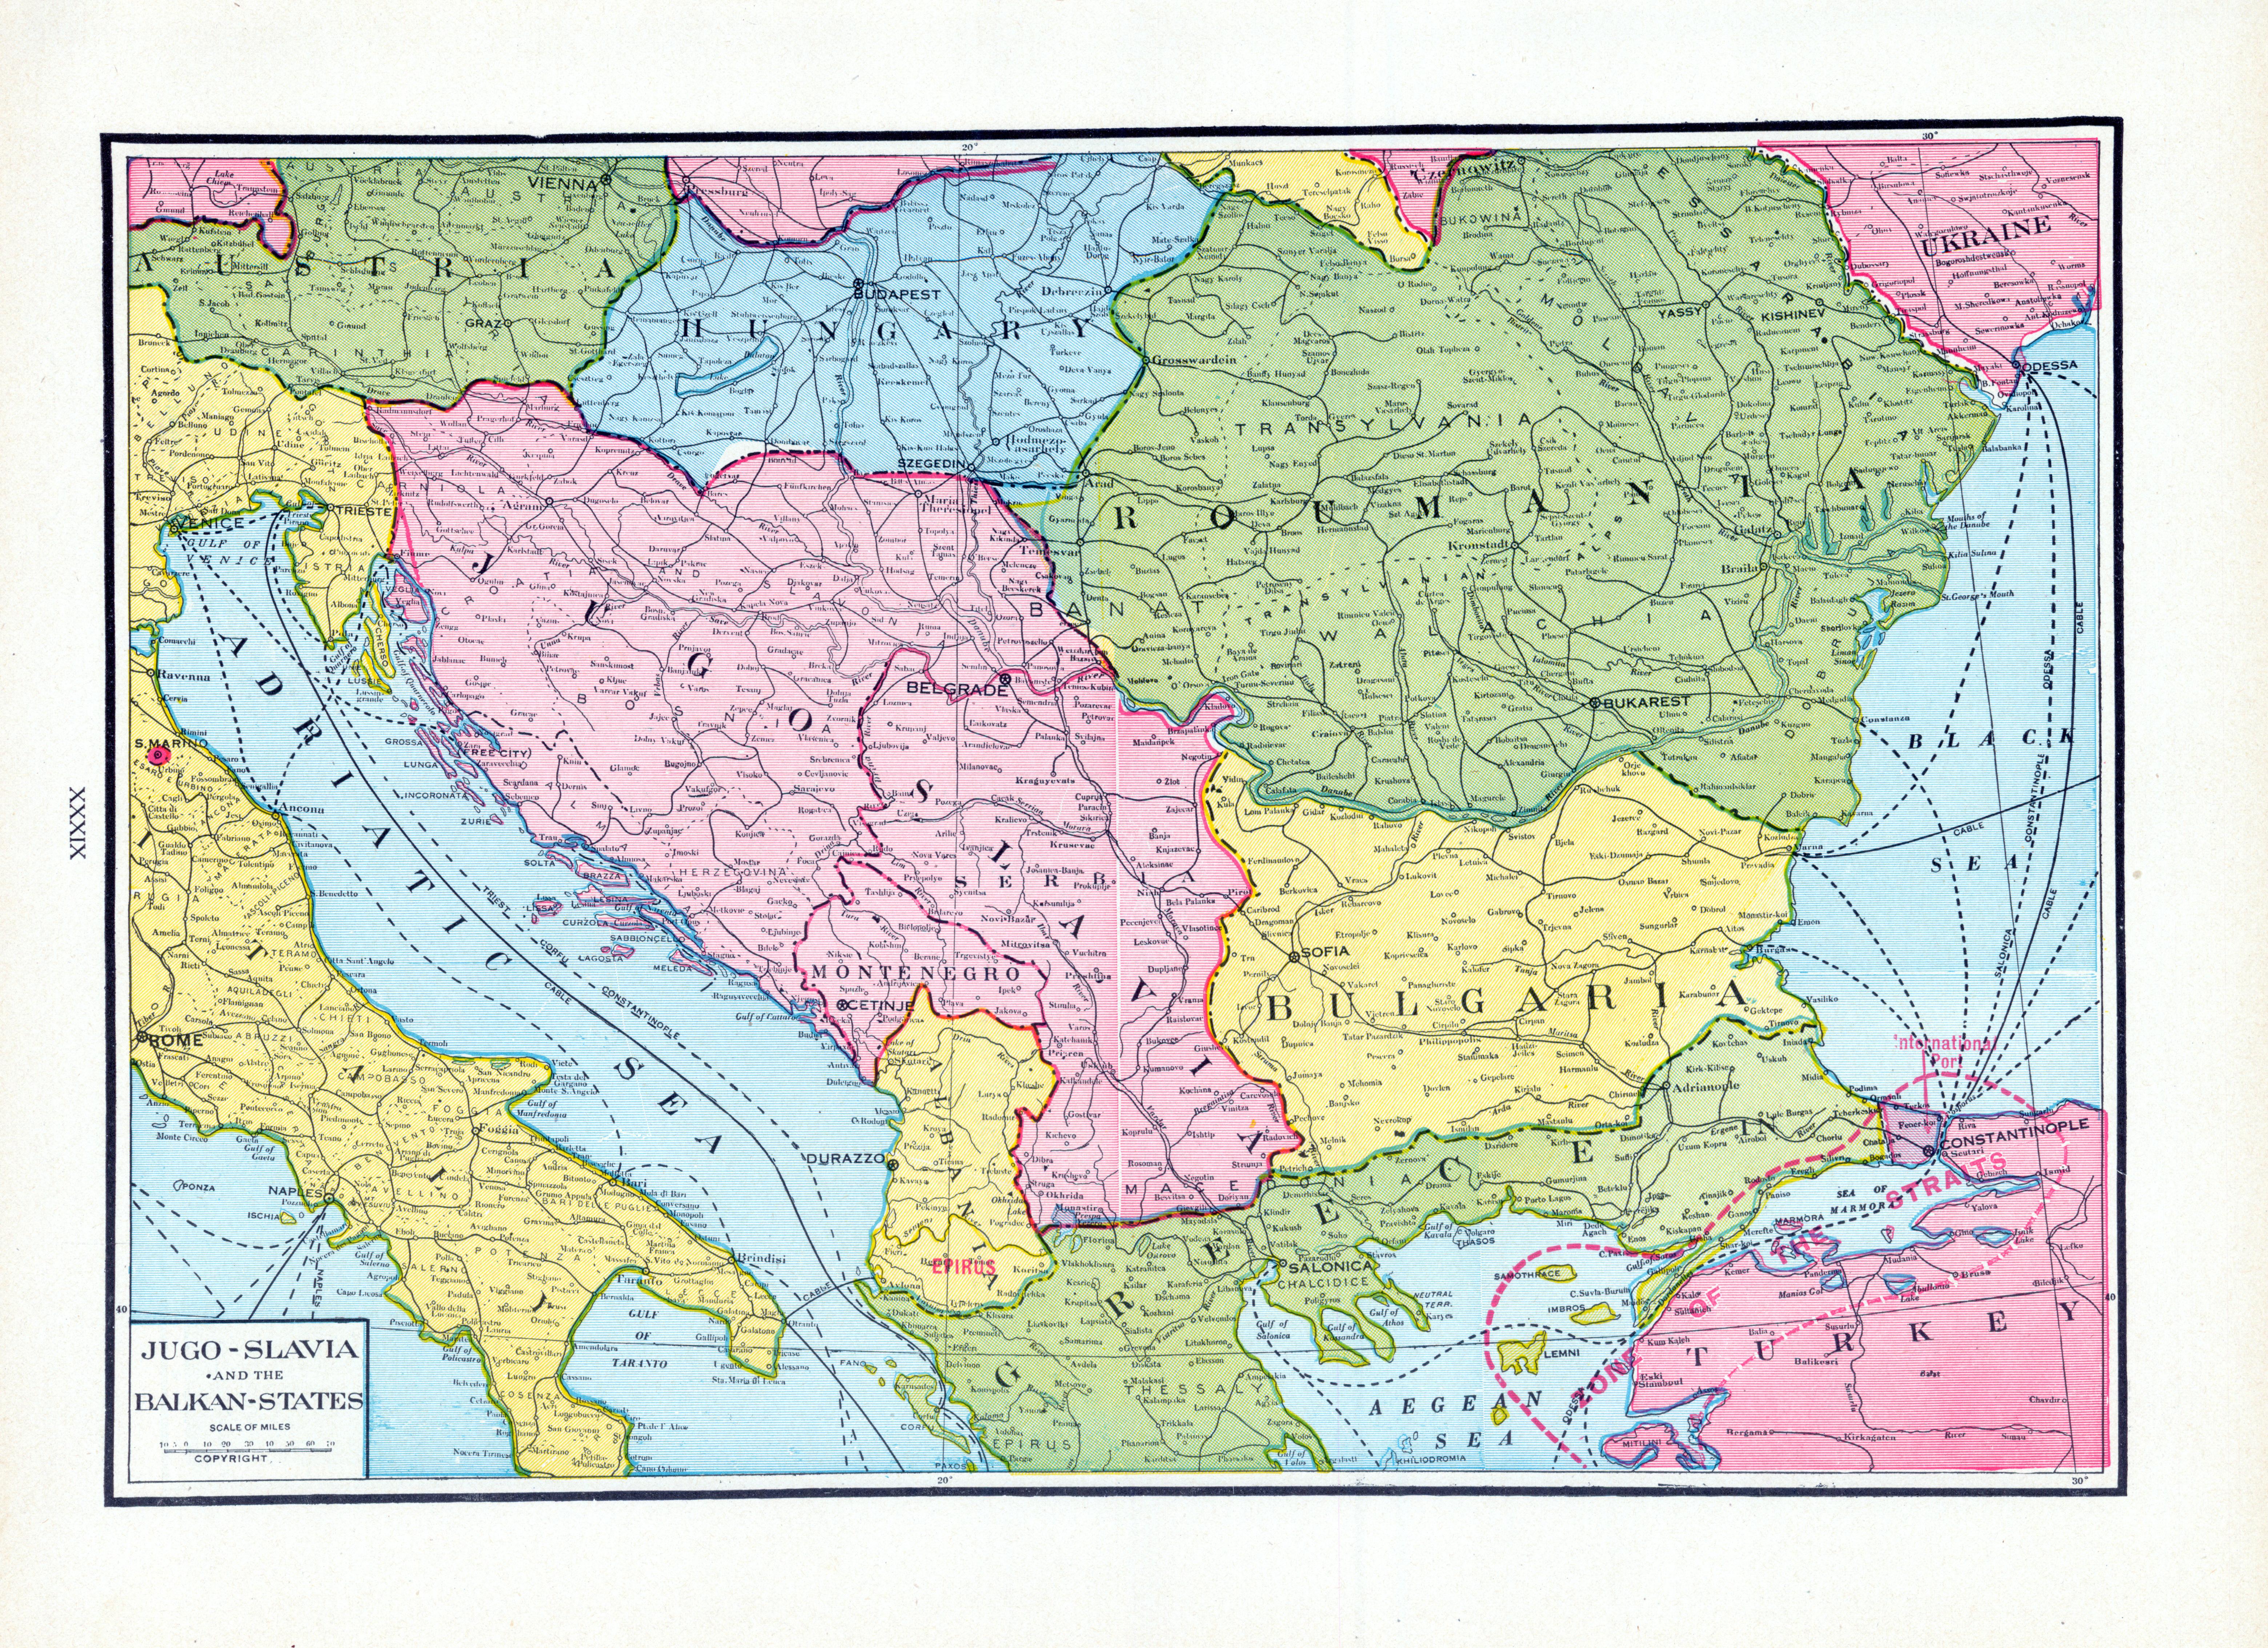 1925, Jugo-Slavia, the Balkan, States, World Atlas  from Prince Edward Island Atlas